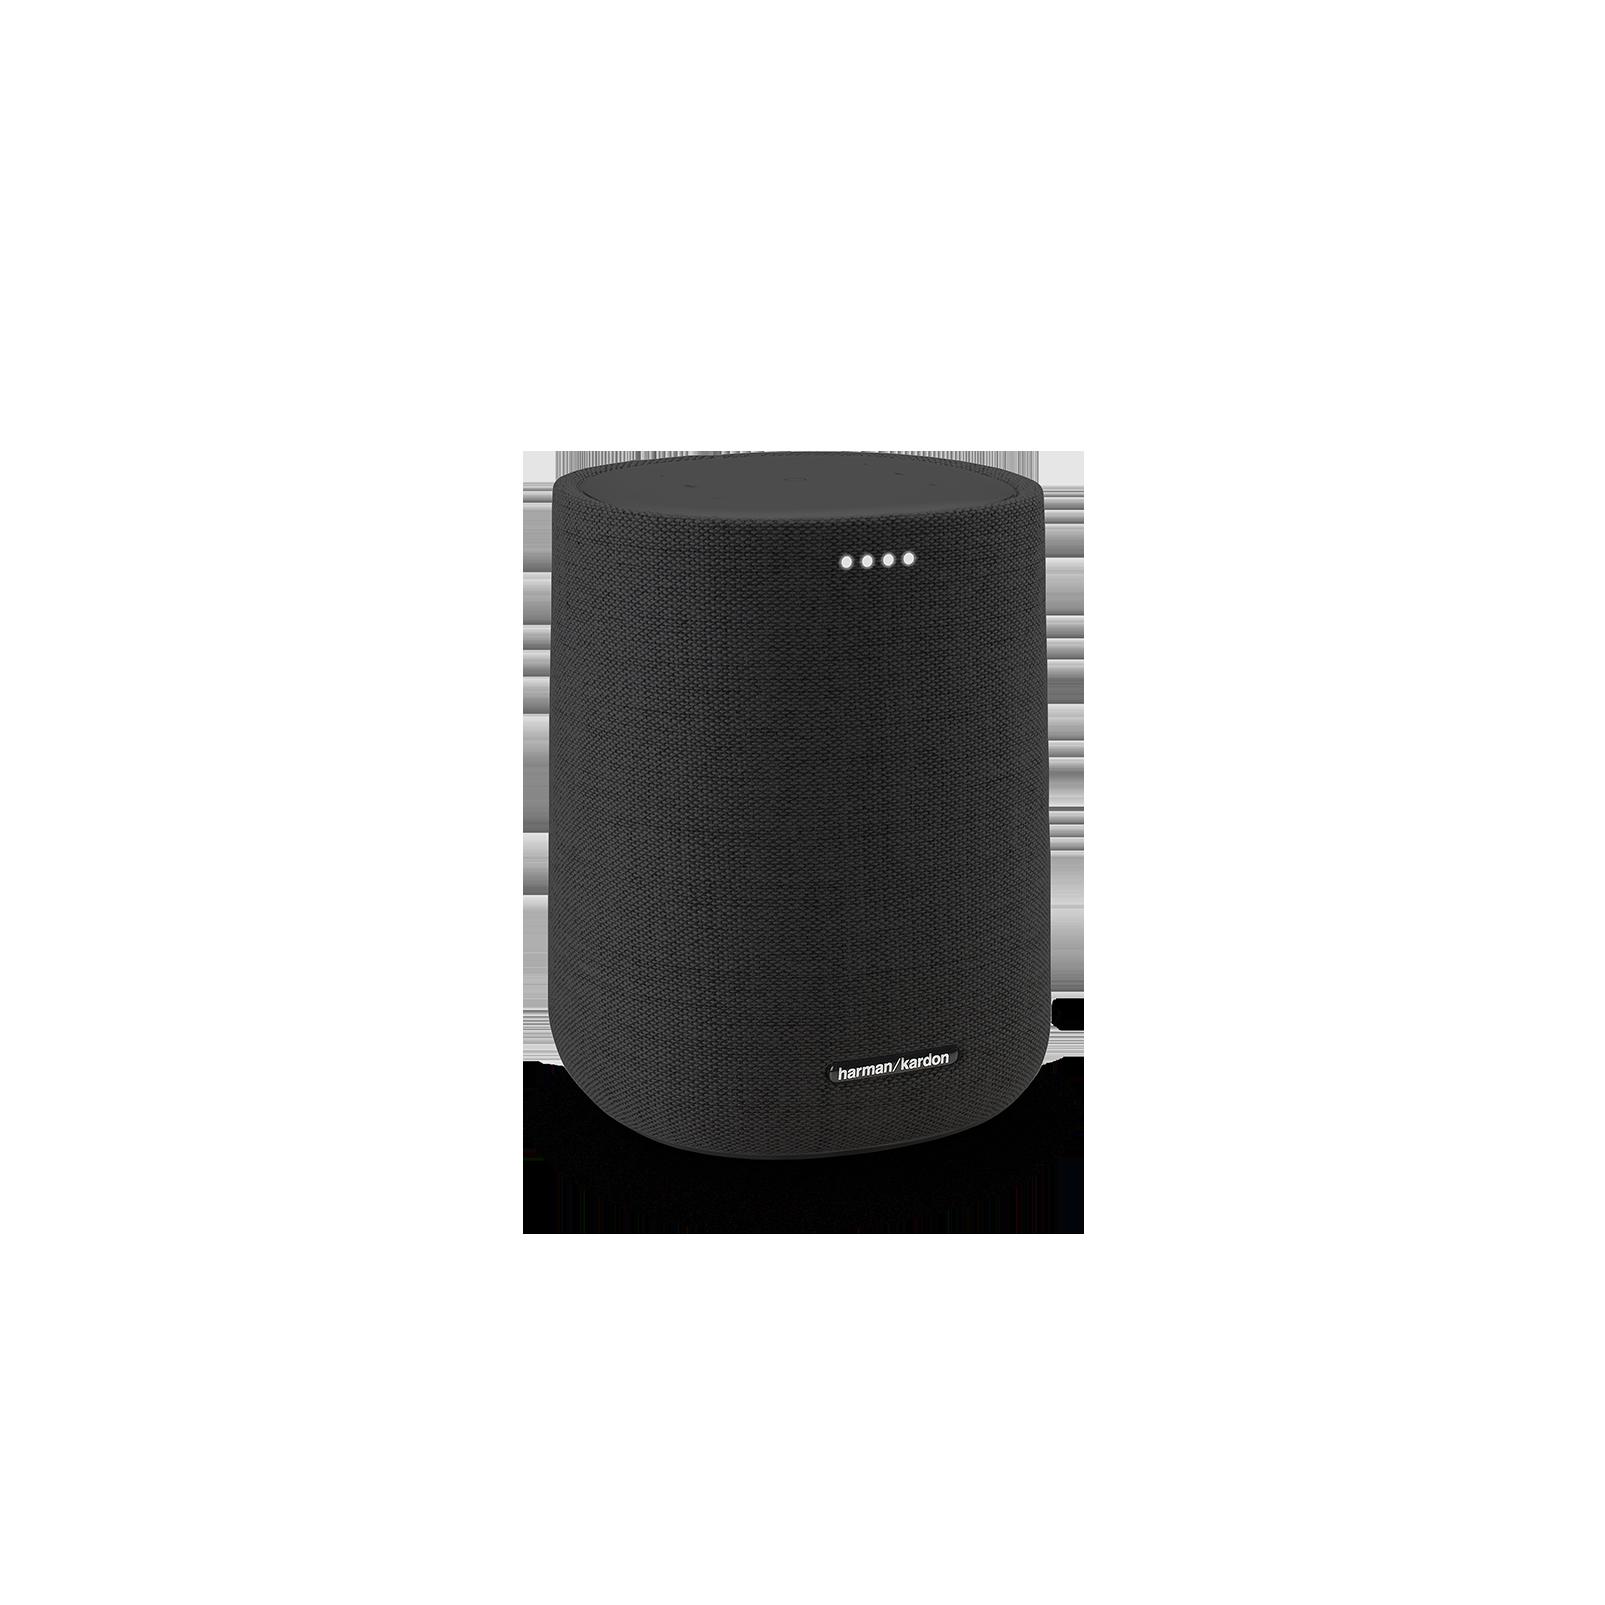 Harman Kardon Citation One MKII - Black - All-in-one smart speaker with room-filling sound - Hero